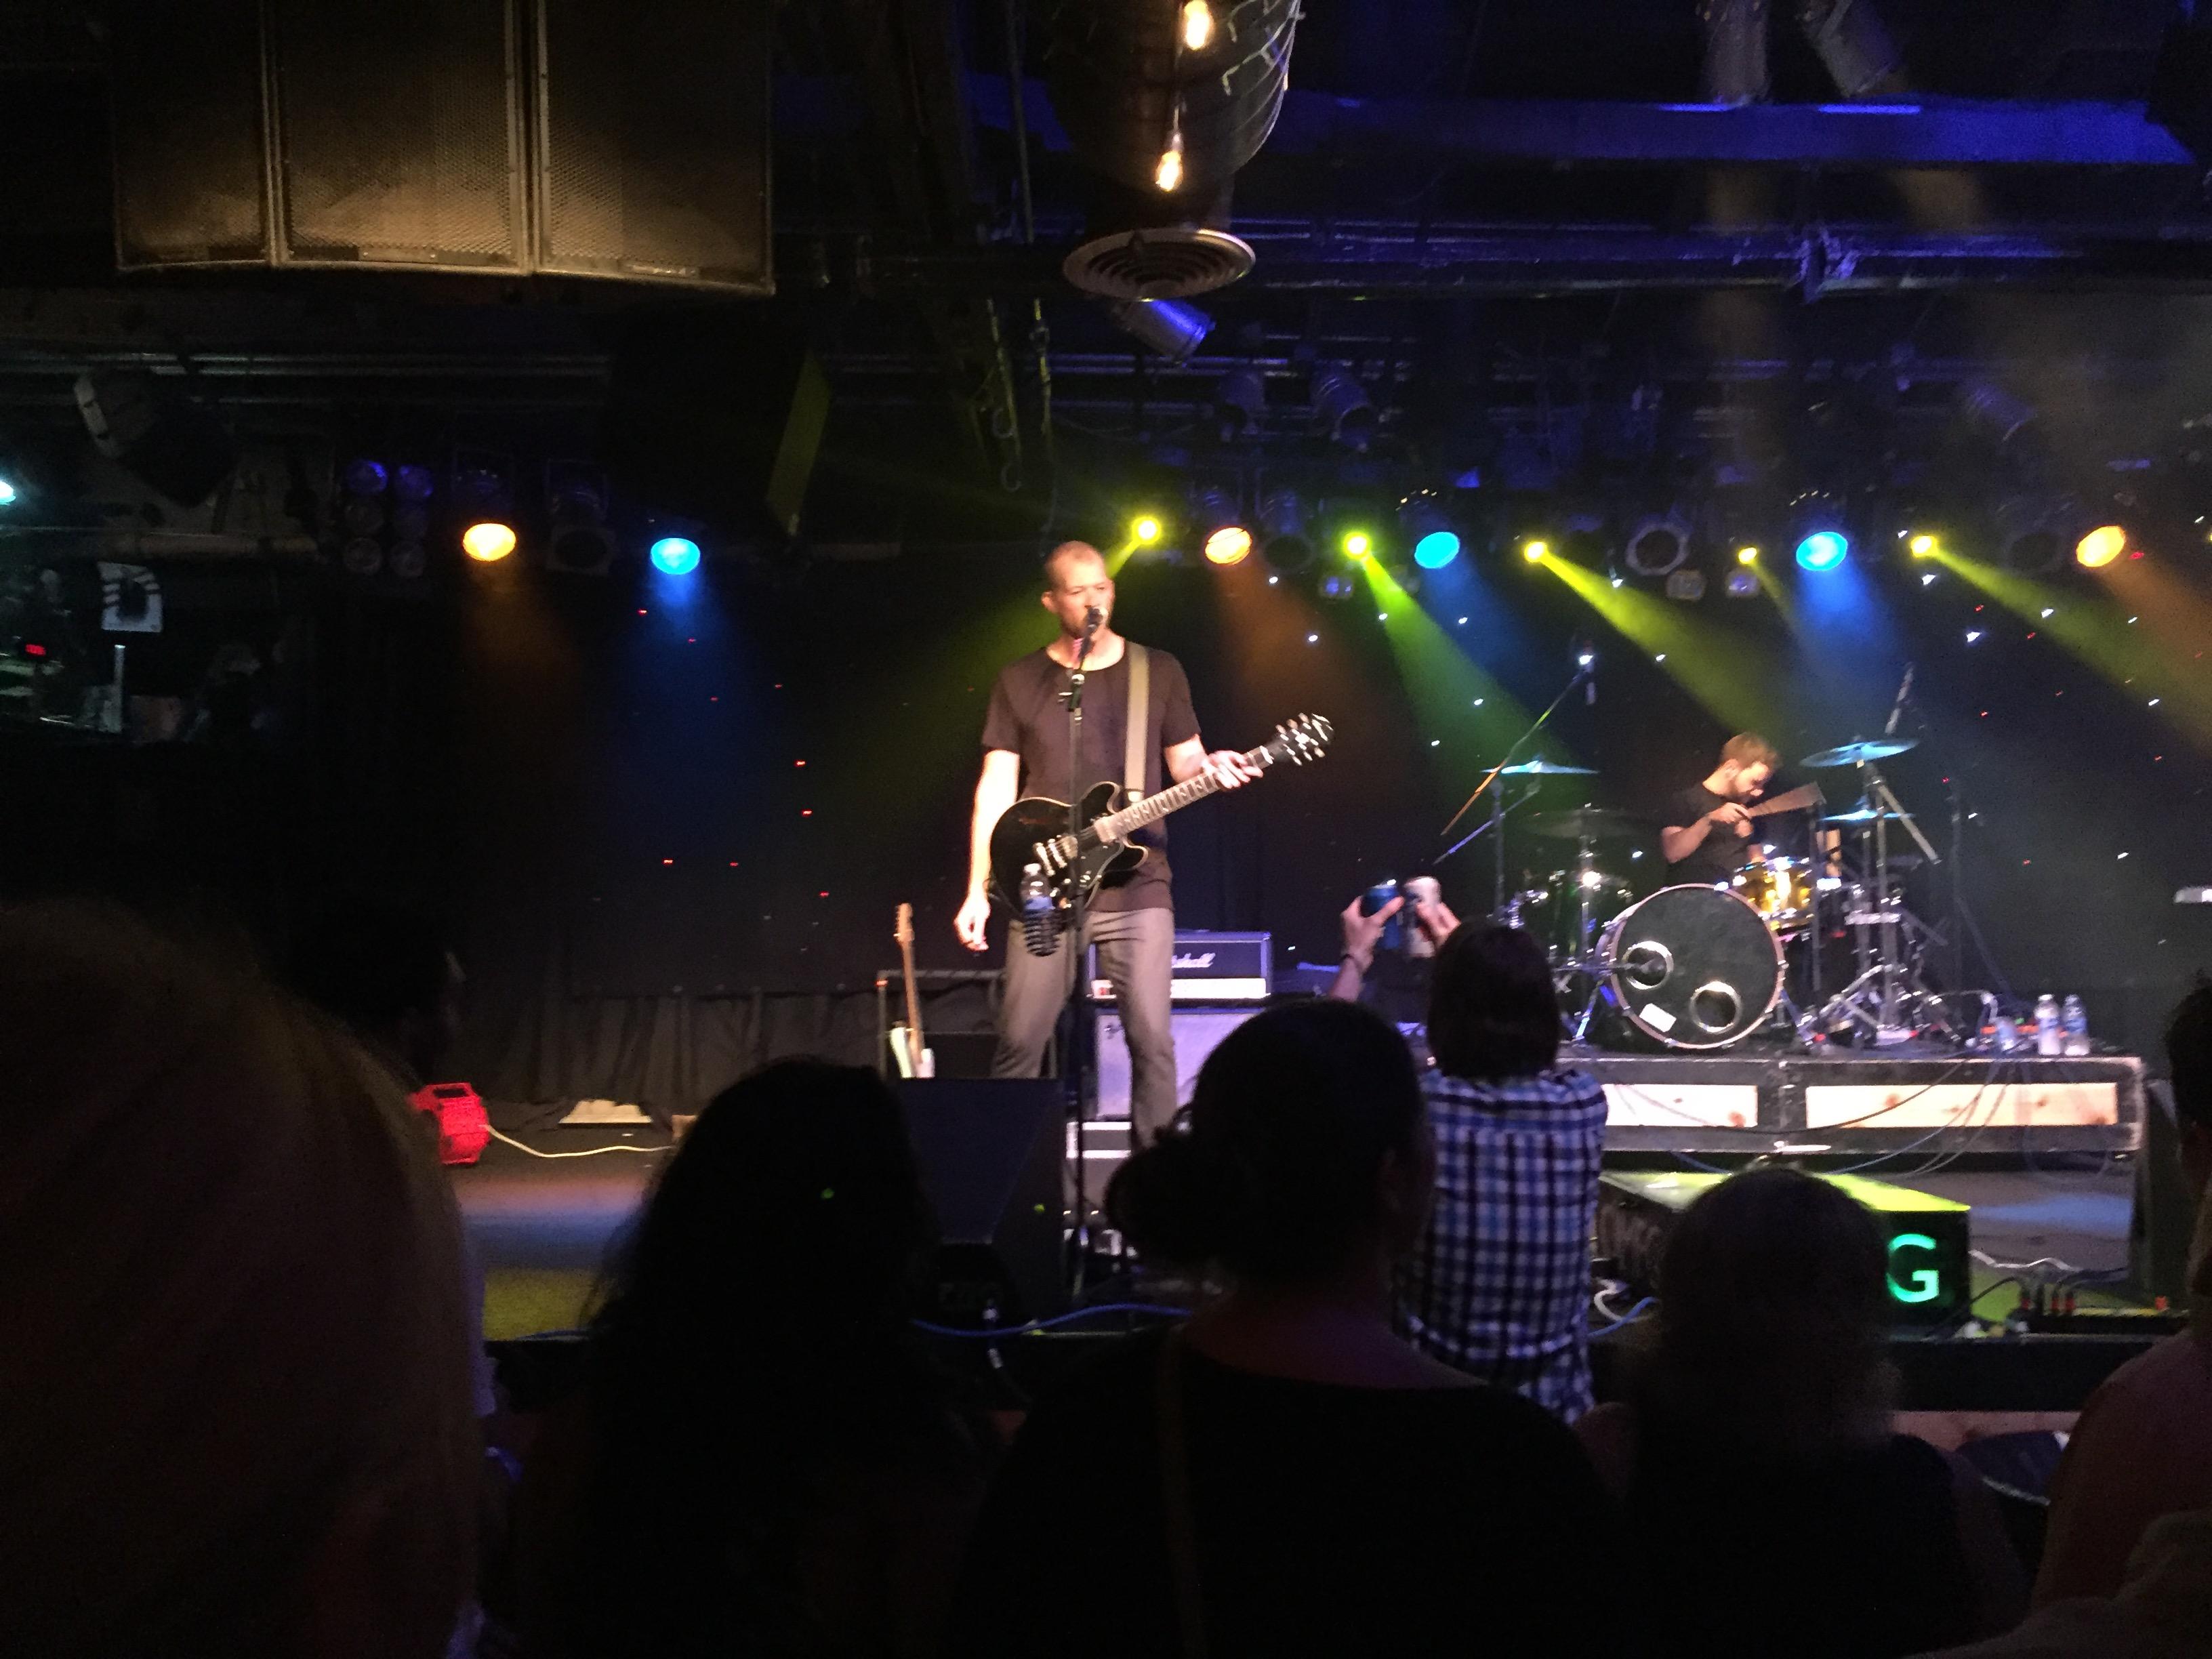 Joes on Weed - Jul 2016